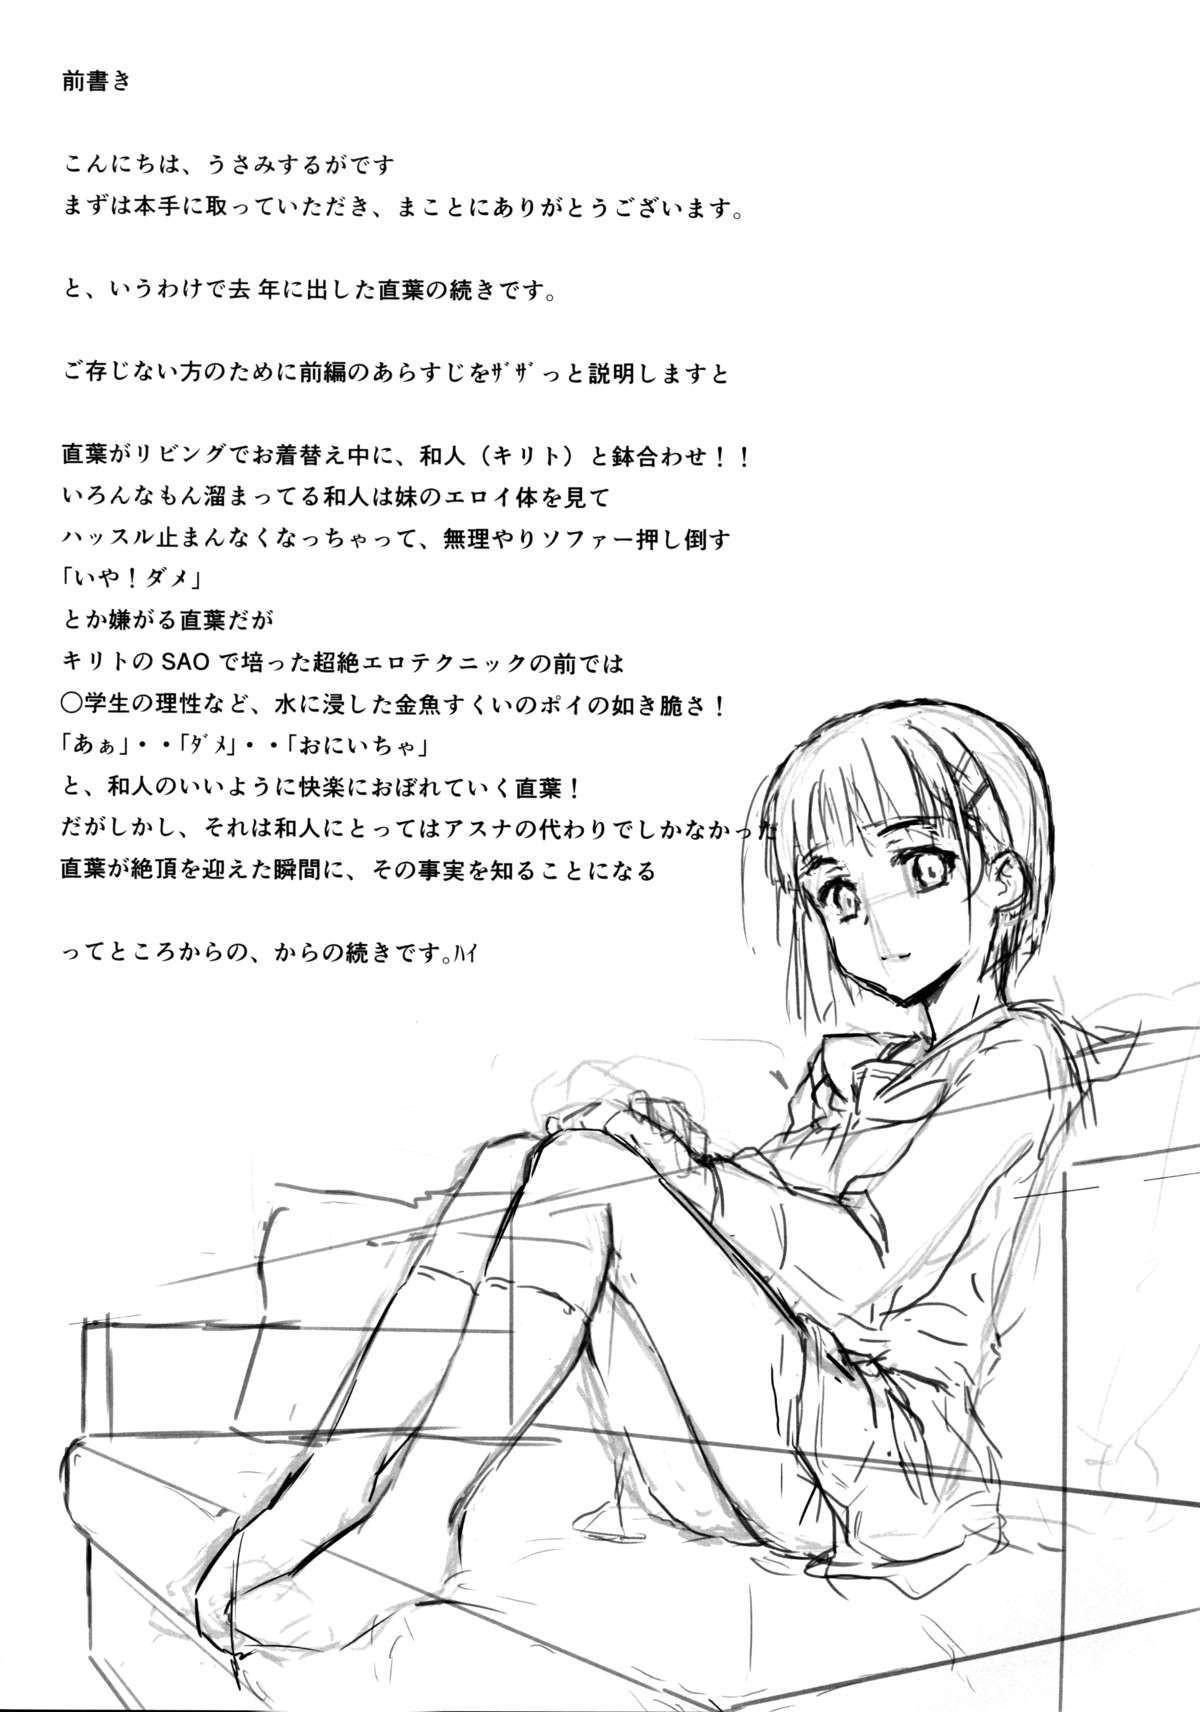 Suguha 03